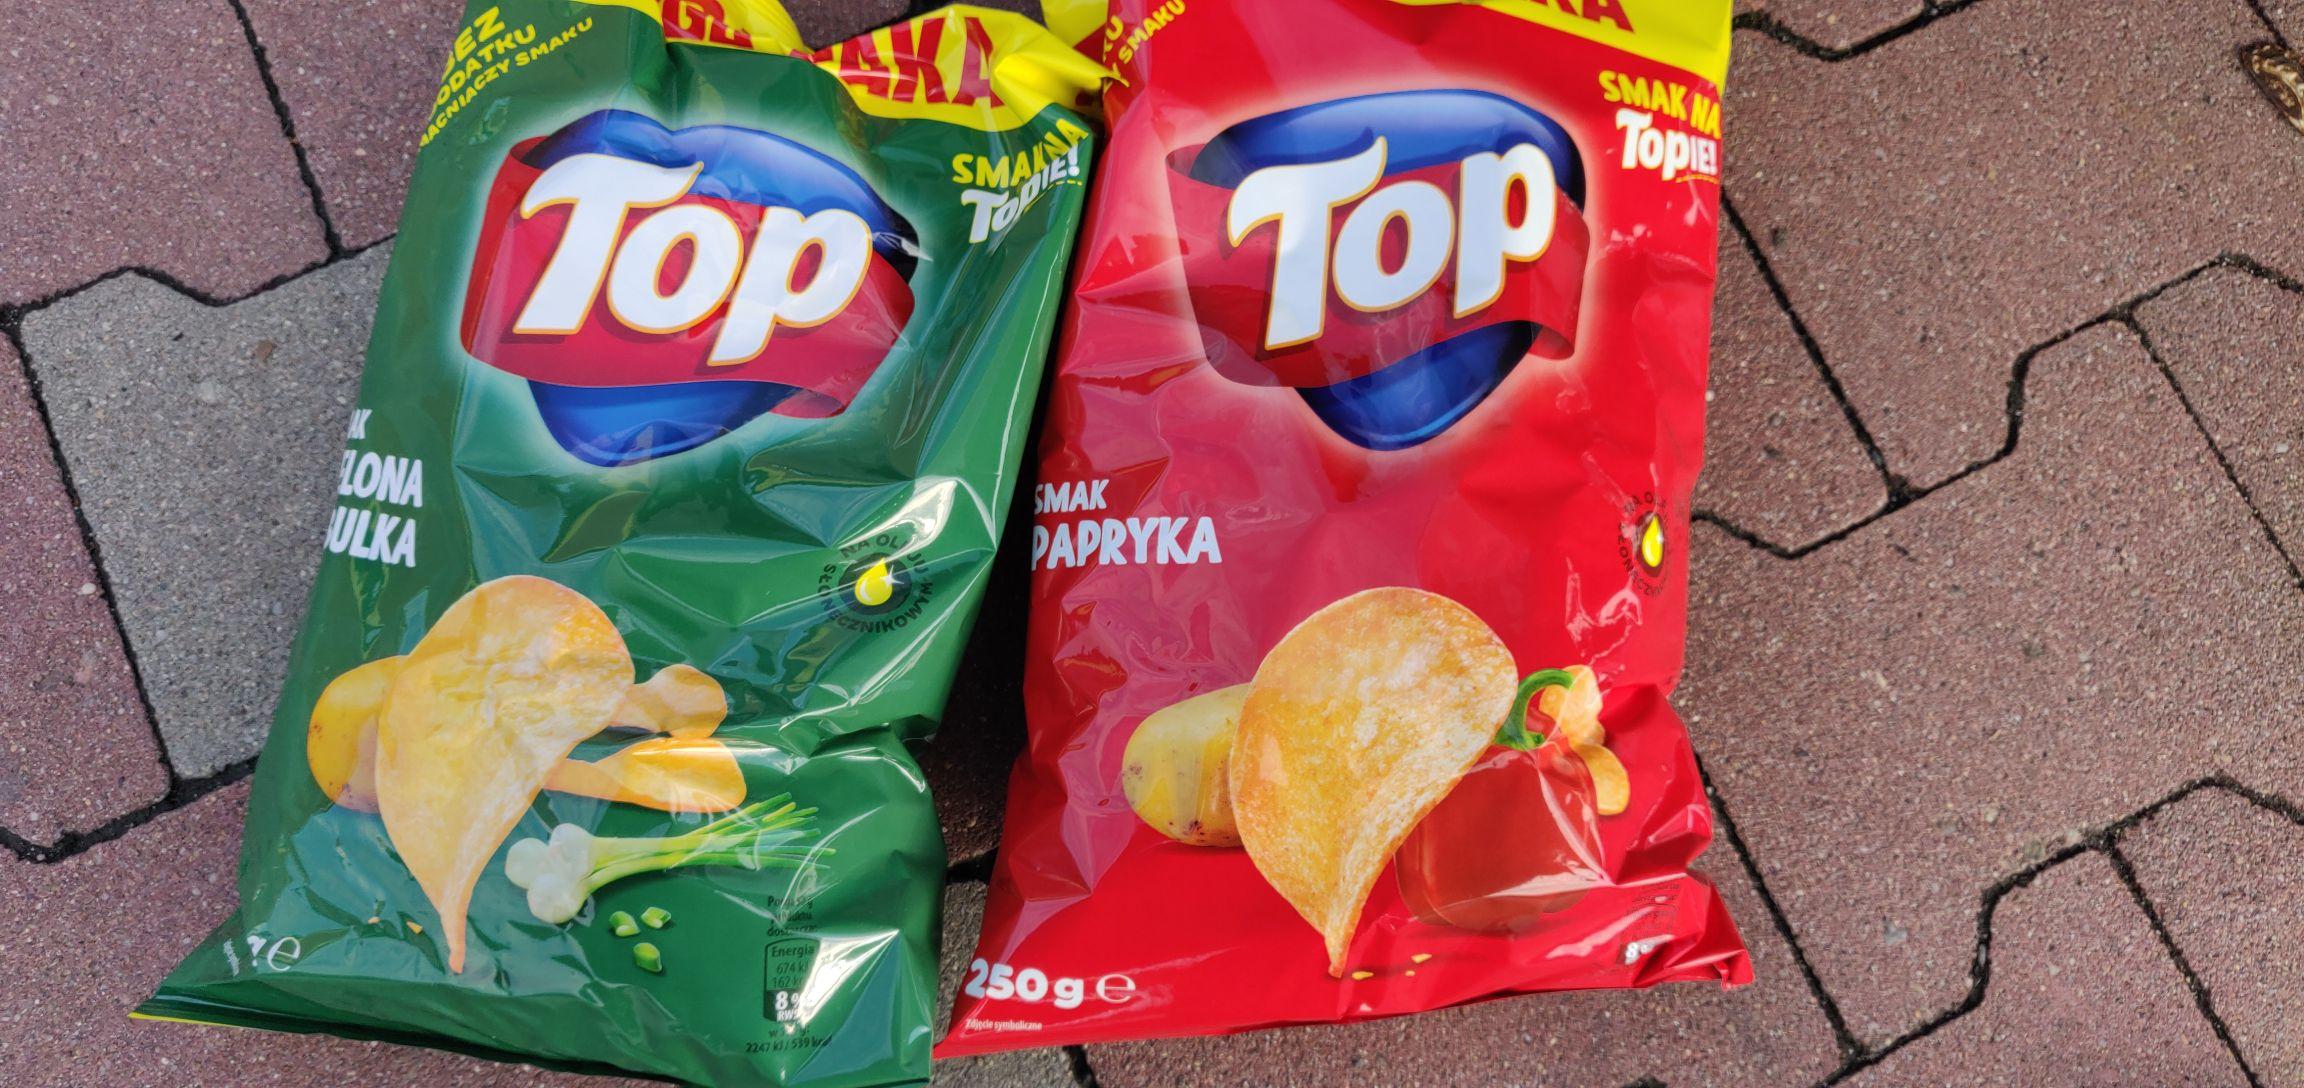 [Biedronka] Chipsy Top Chips Papryka / Zielona Cebulka MEGA PAKA 250g 3.49 zł